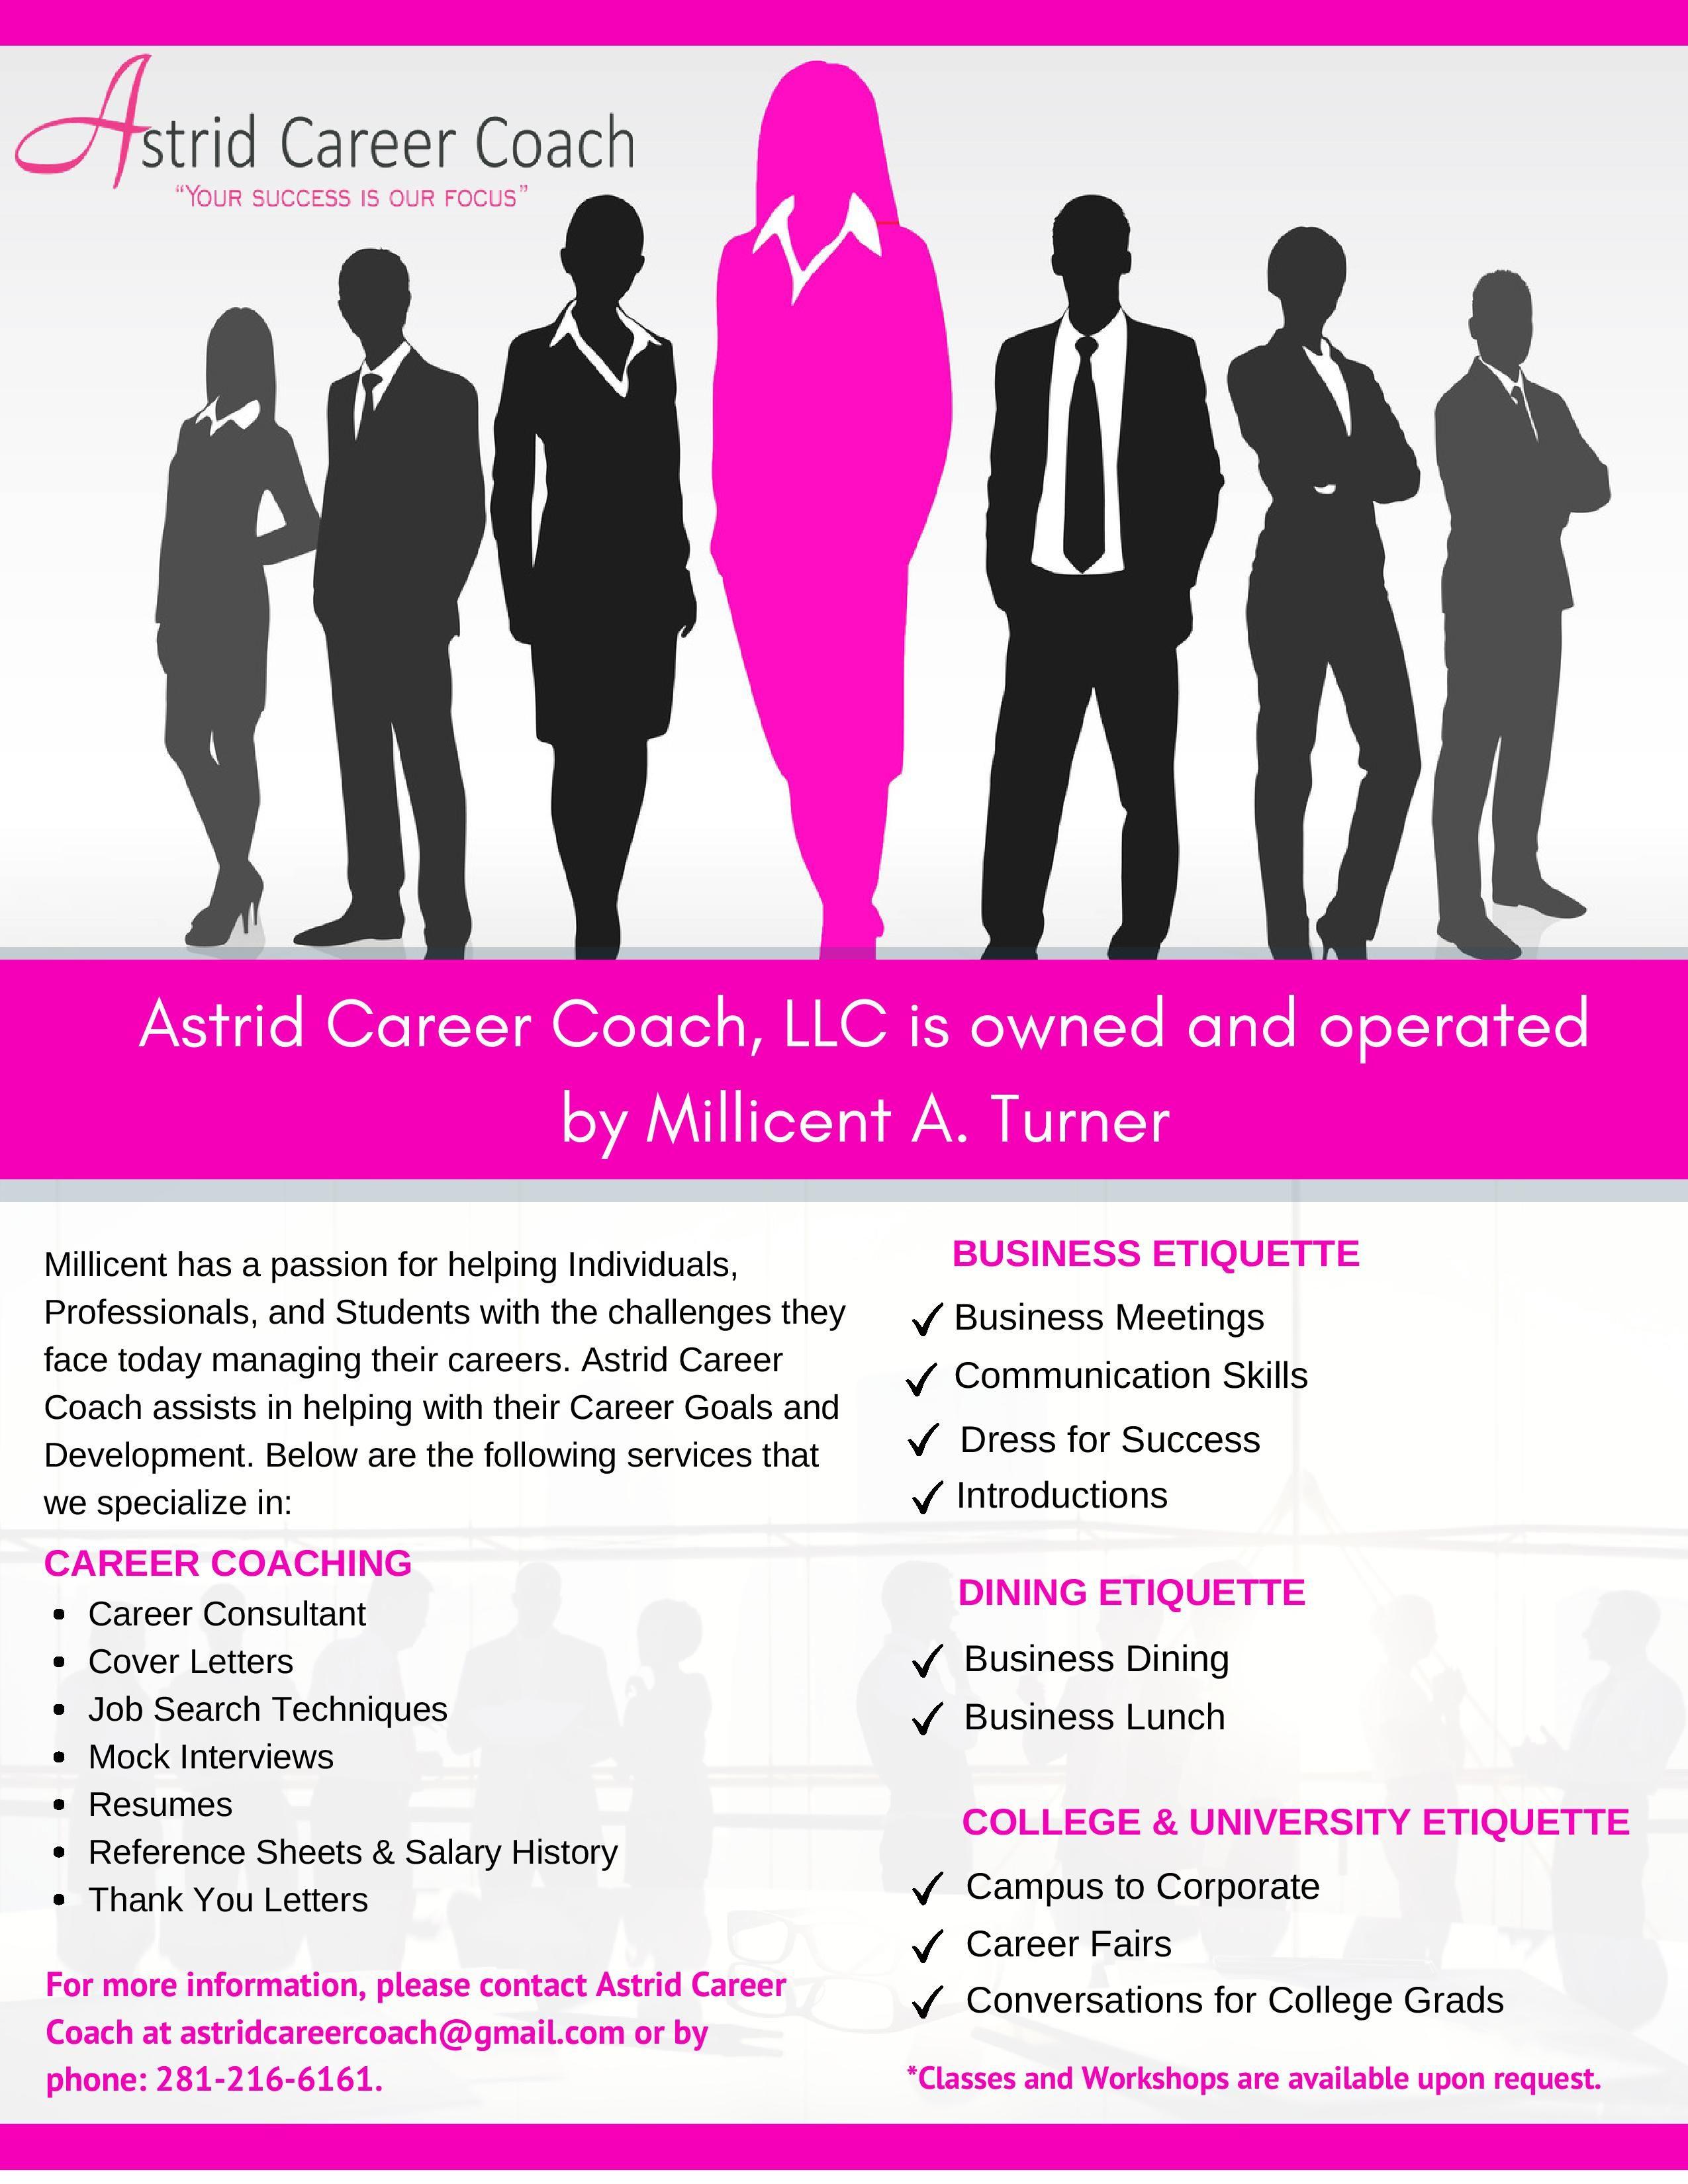 career coach cover letter etiquette interviewing resumes etc